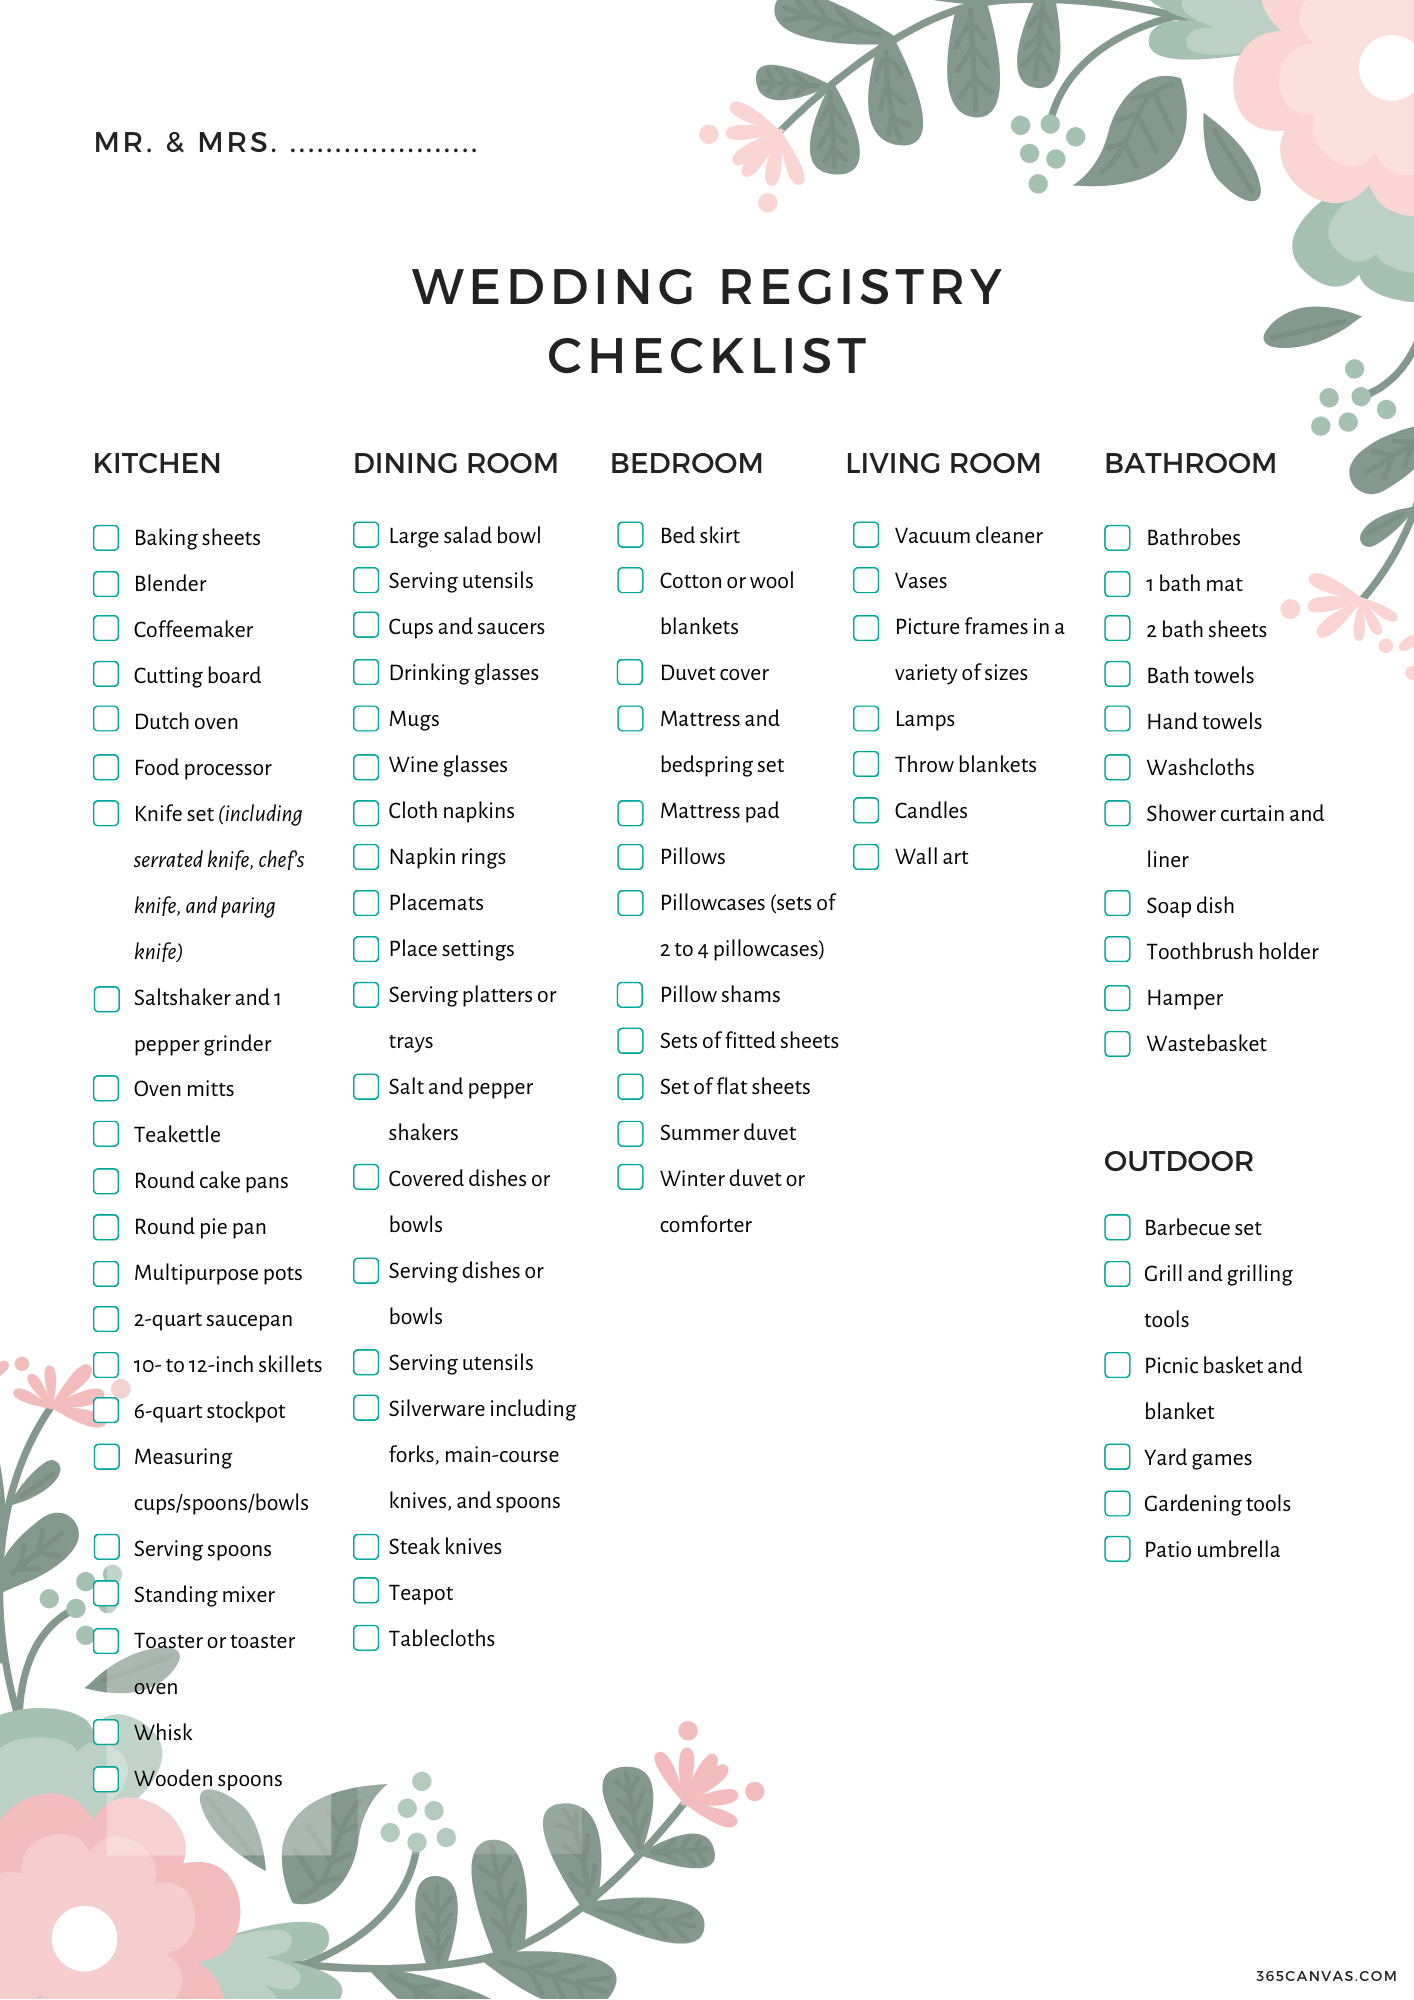 The Complete Wedding Registry Checklist Free Printable For Couples Wedding Registry Checklist Complete Wedding Registry Checklist Wedding Registry Checklist Printable